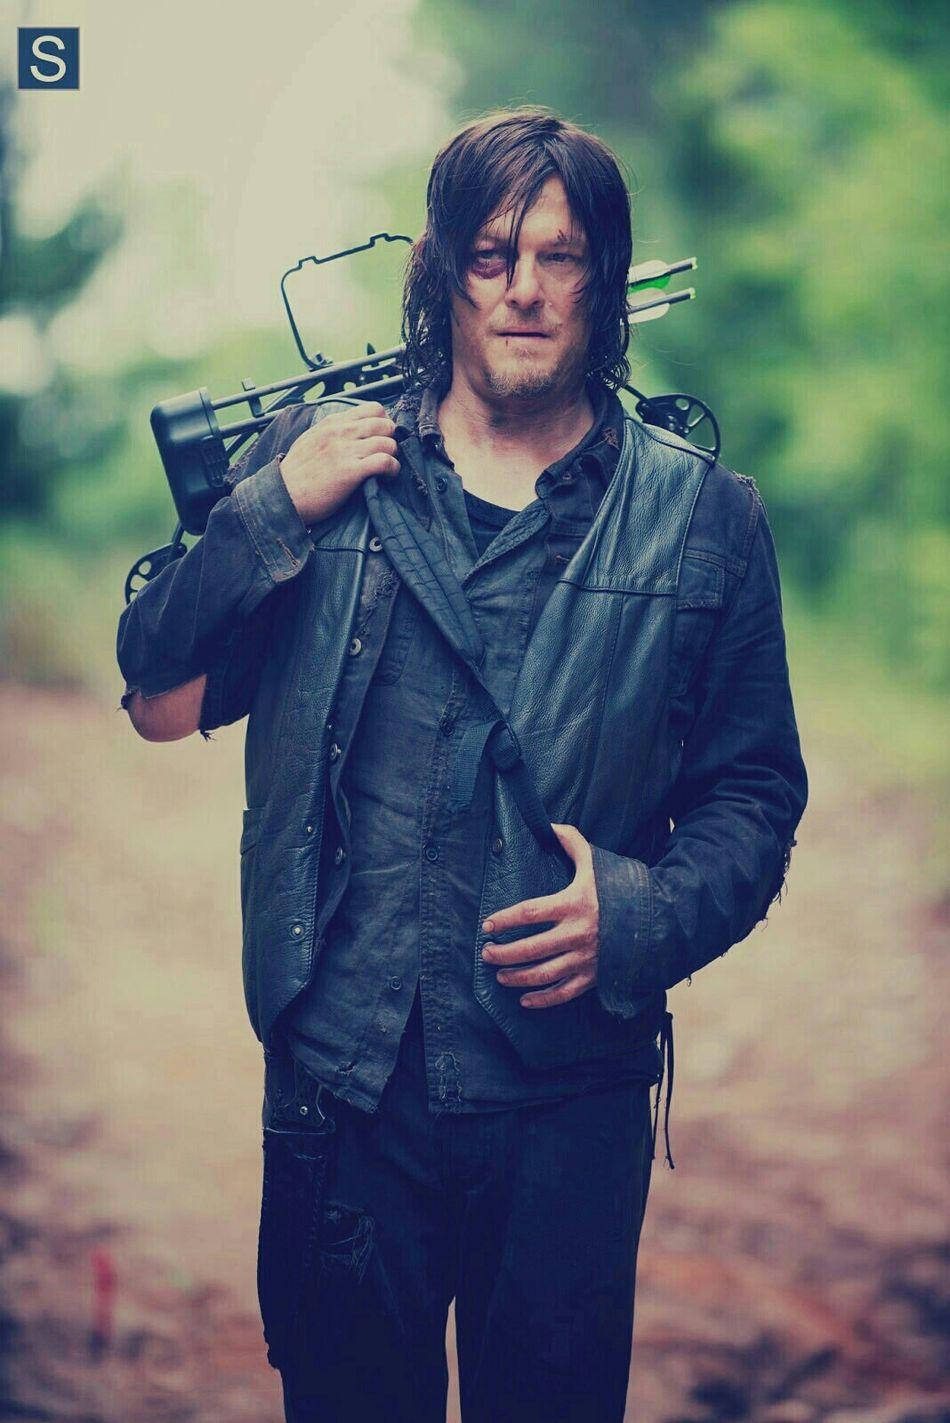 Daryl Dixon Norman Reedus The Walking Dead EyeEm Gallery First Eyeem Photo